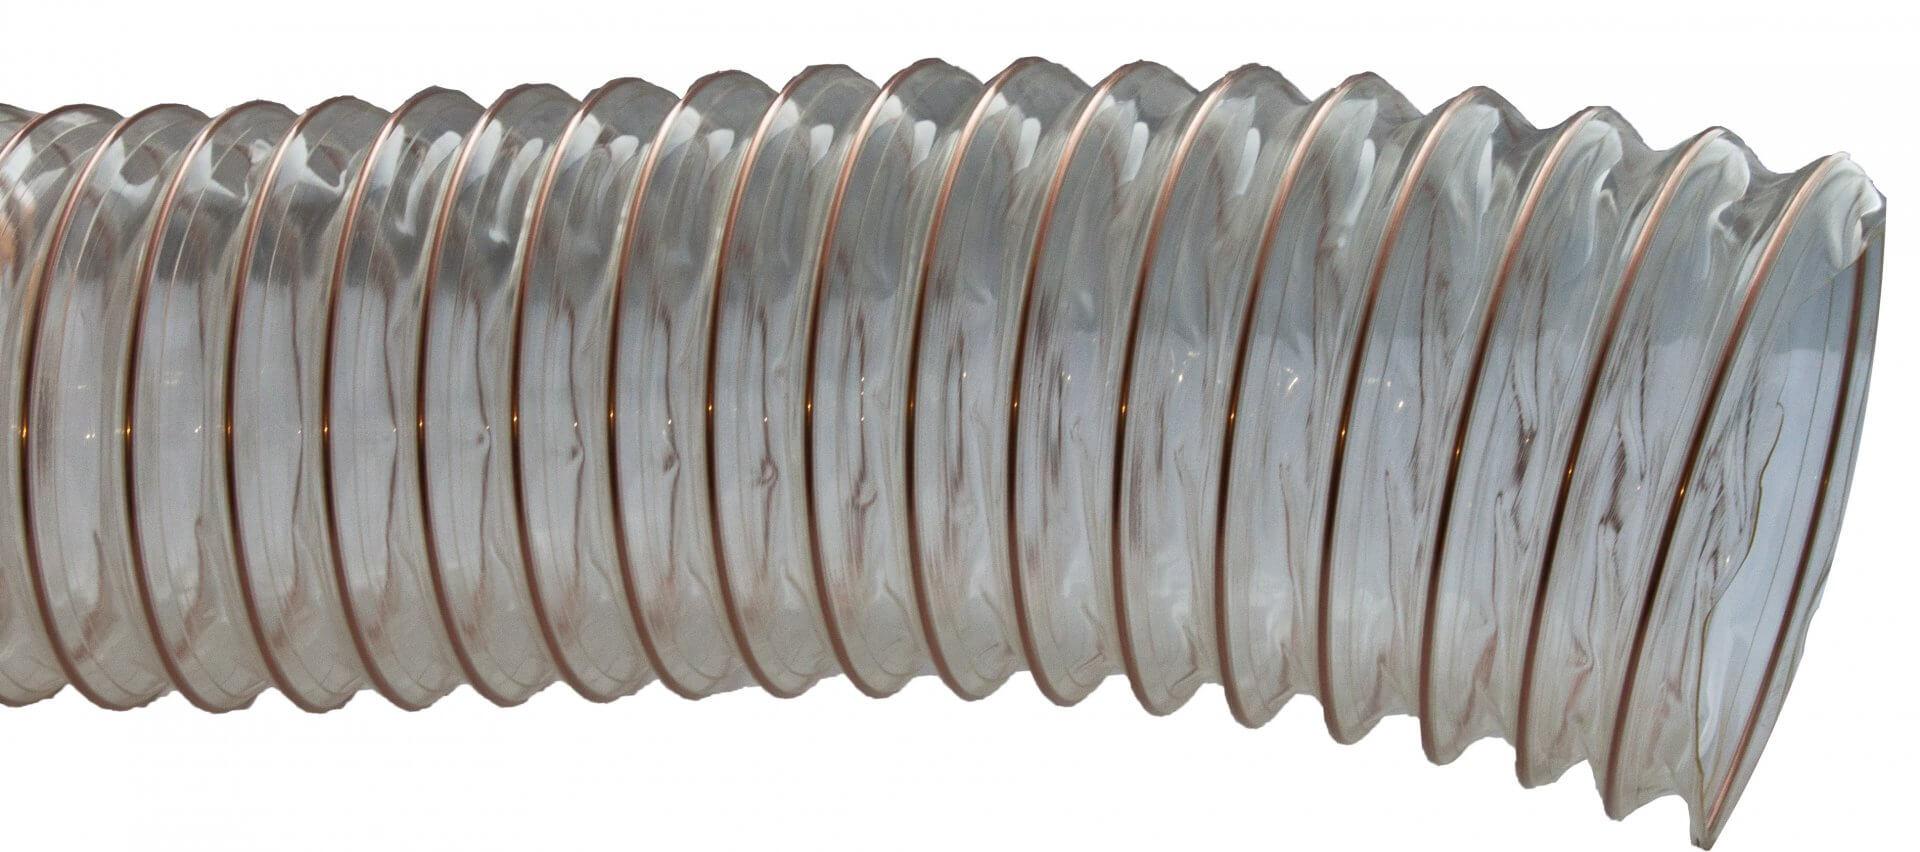 Puruletku P2PU 10m (102mm-erikoiskoko) - Kailatec Oy Verkkokauppa